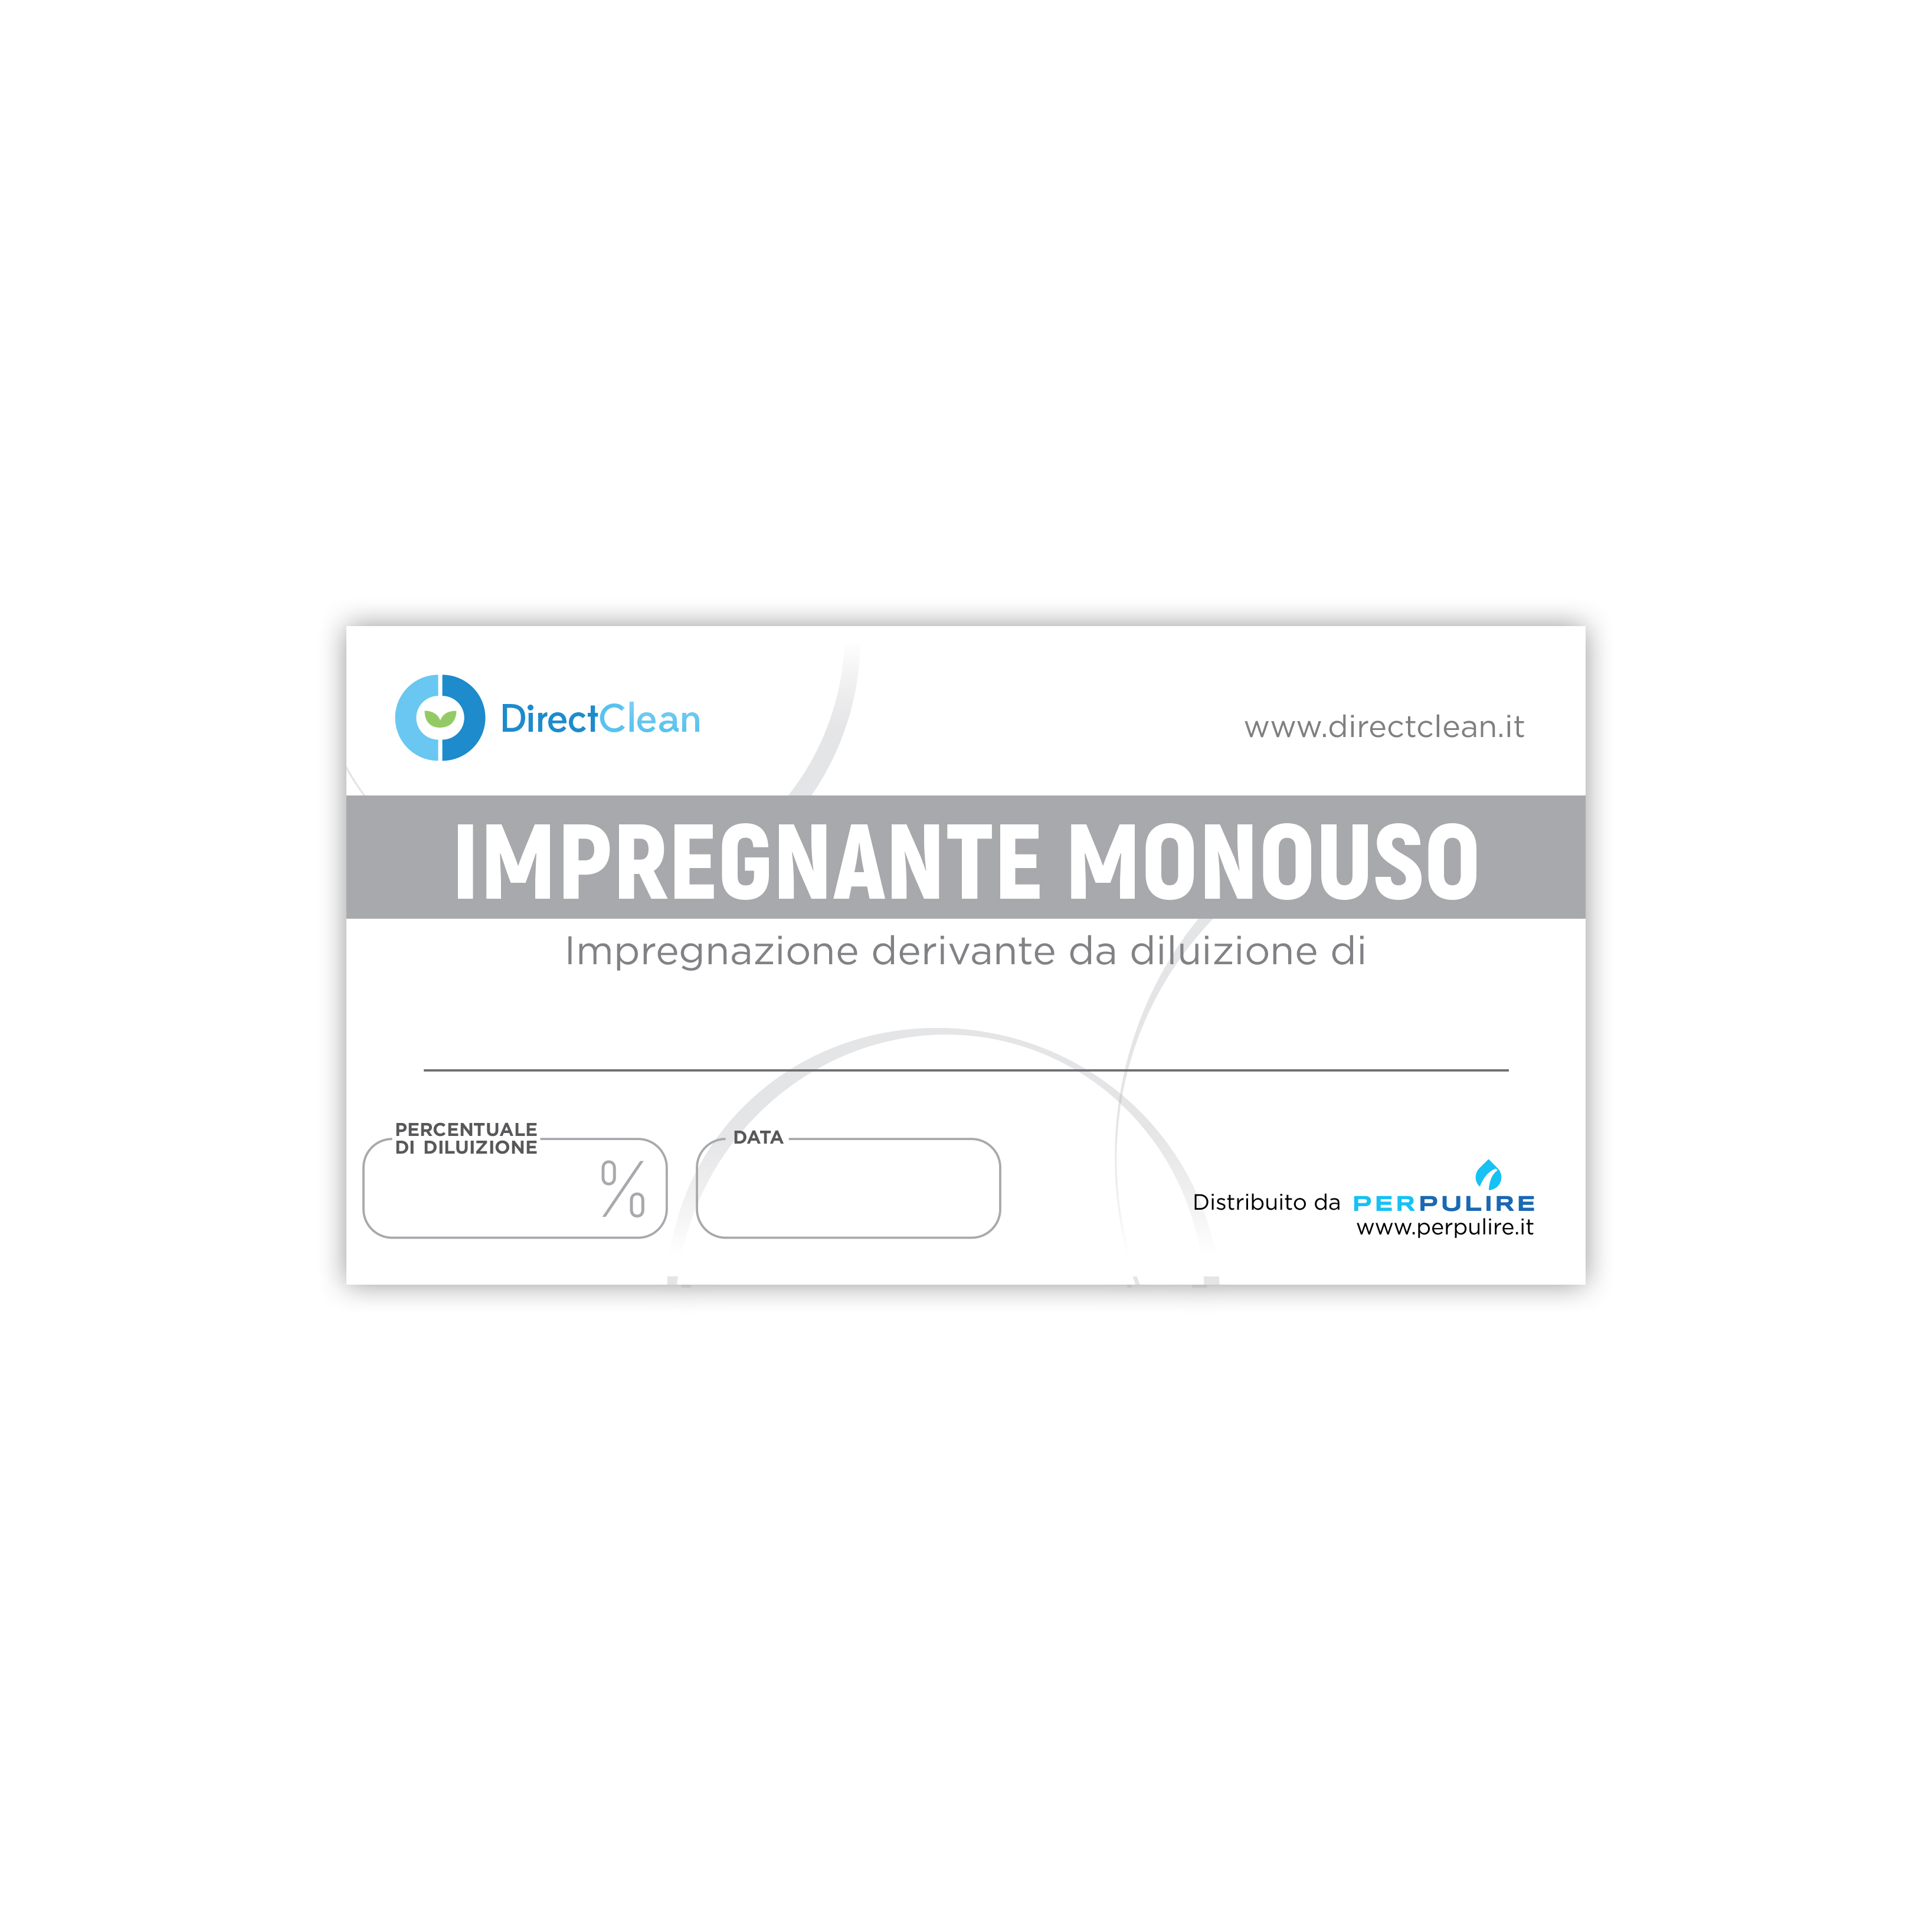 ETICHETTA IMPREGNANTE MONOUSO BIANCA DIRECT CLEAN 10X5 CM